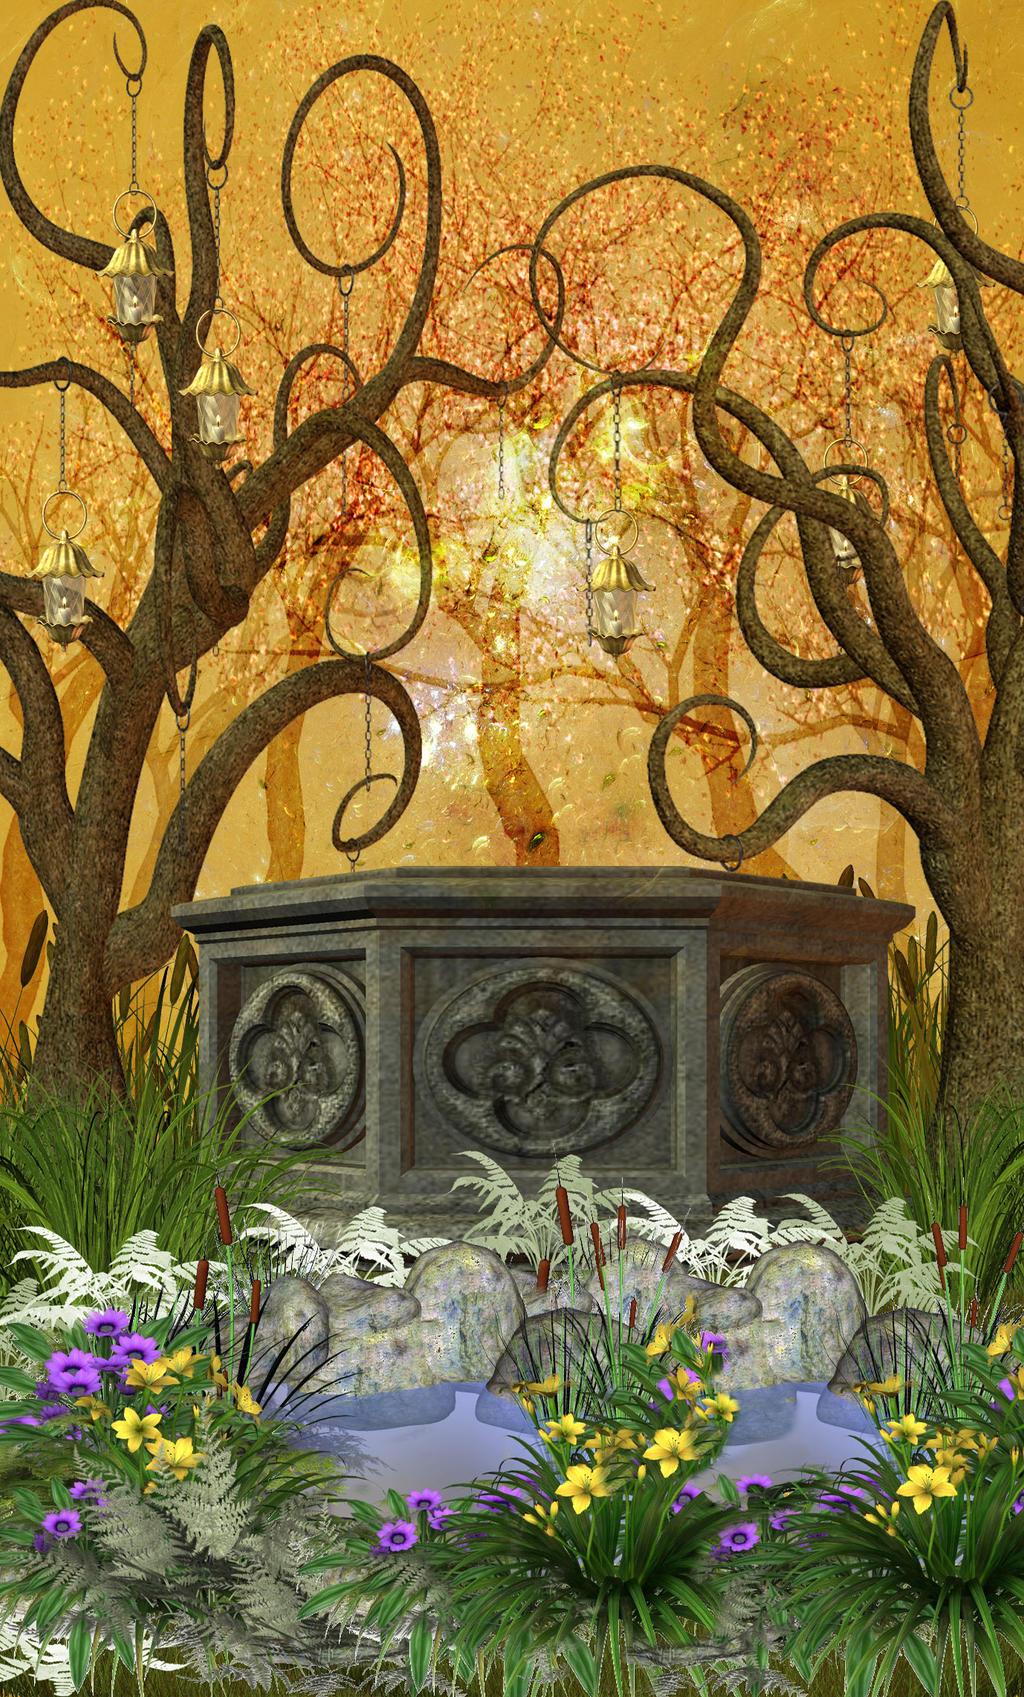 Enchanted garden premade background by virgolinedancer1 on deviantart - Enchanted garden collection free download ...